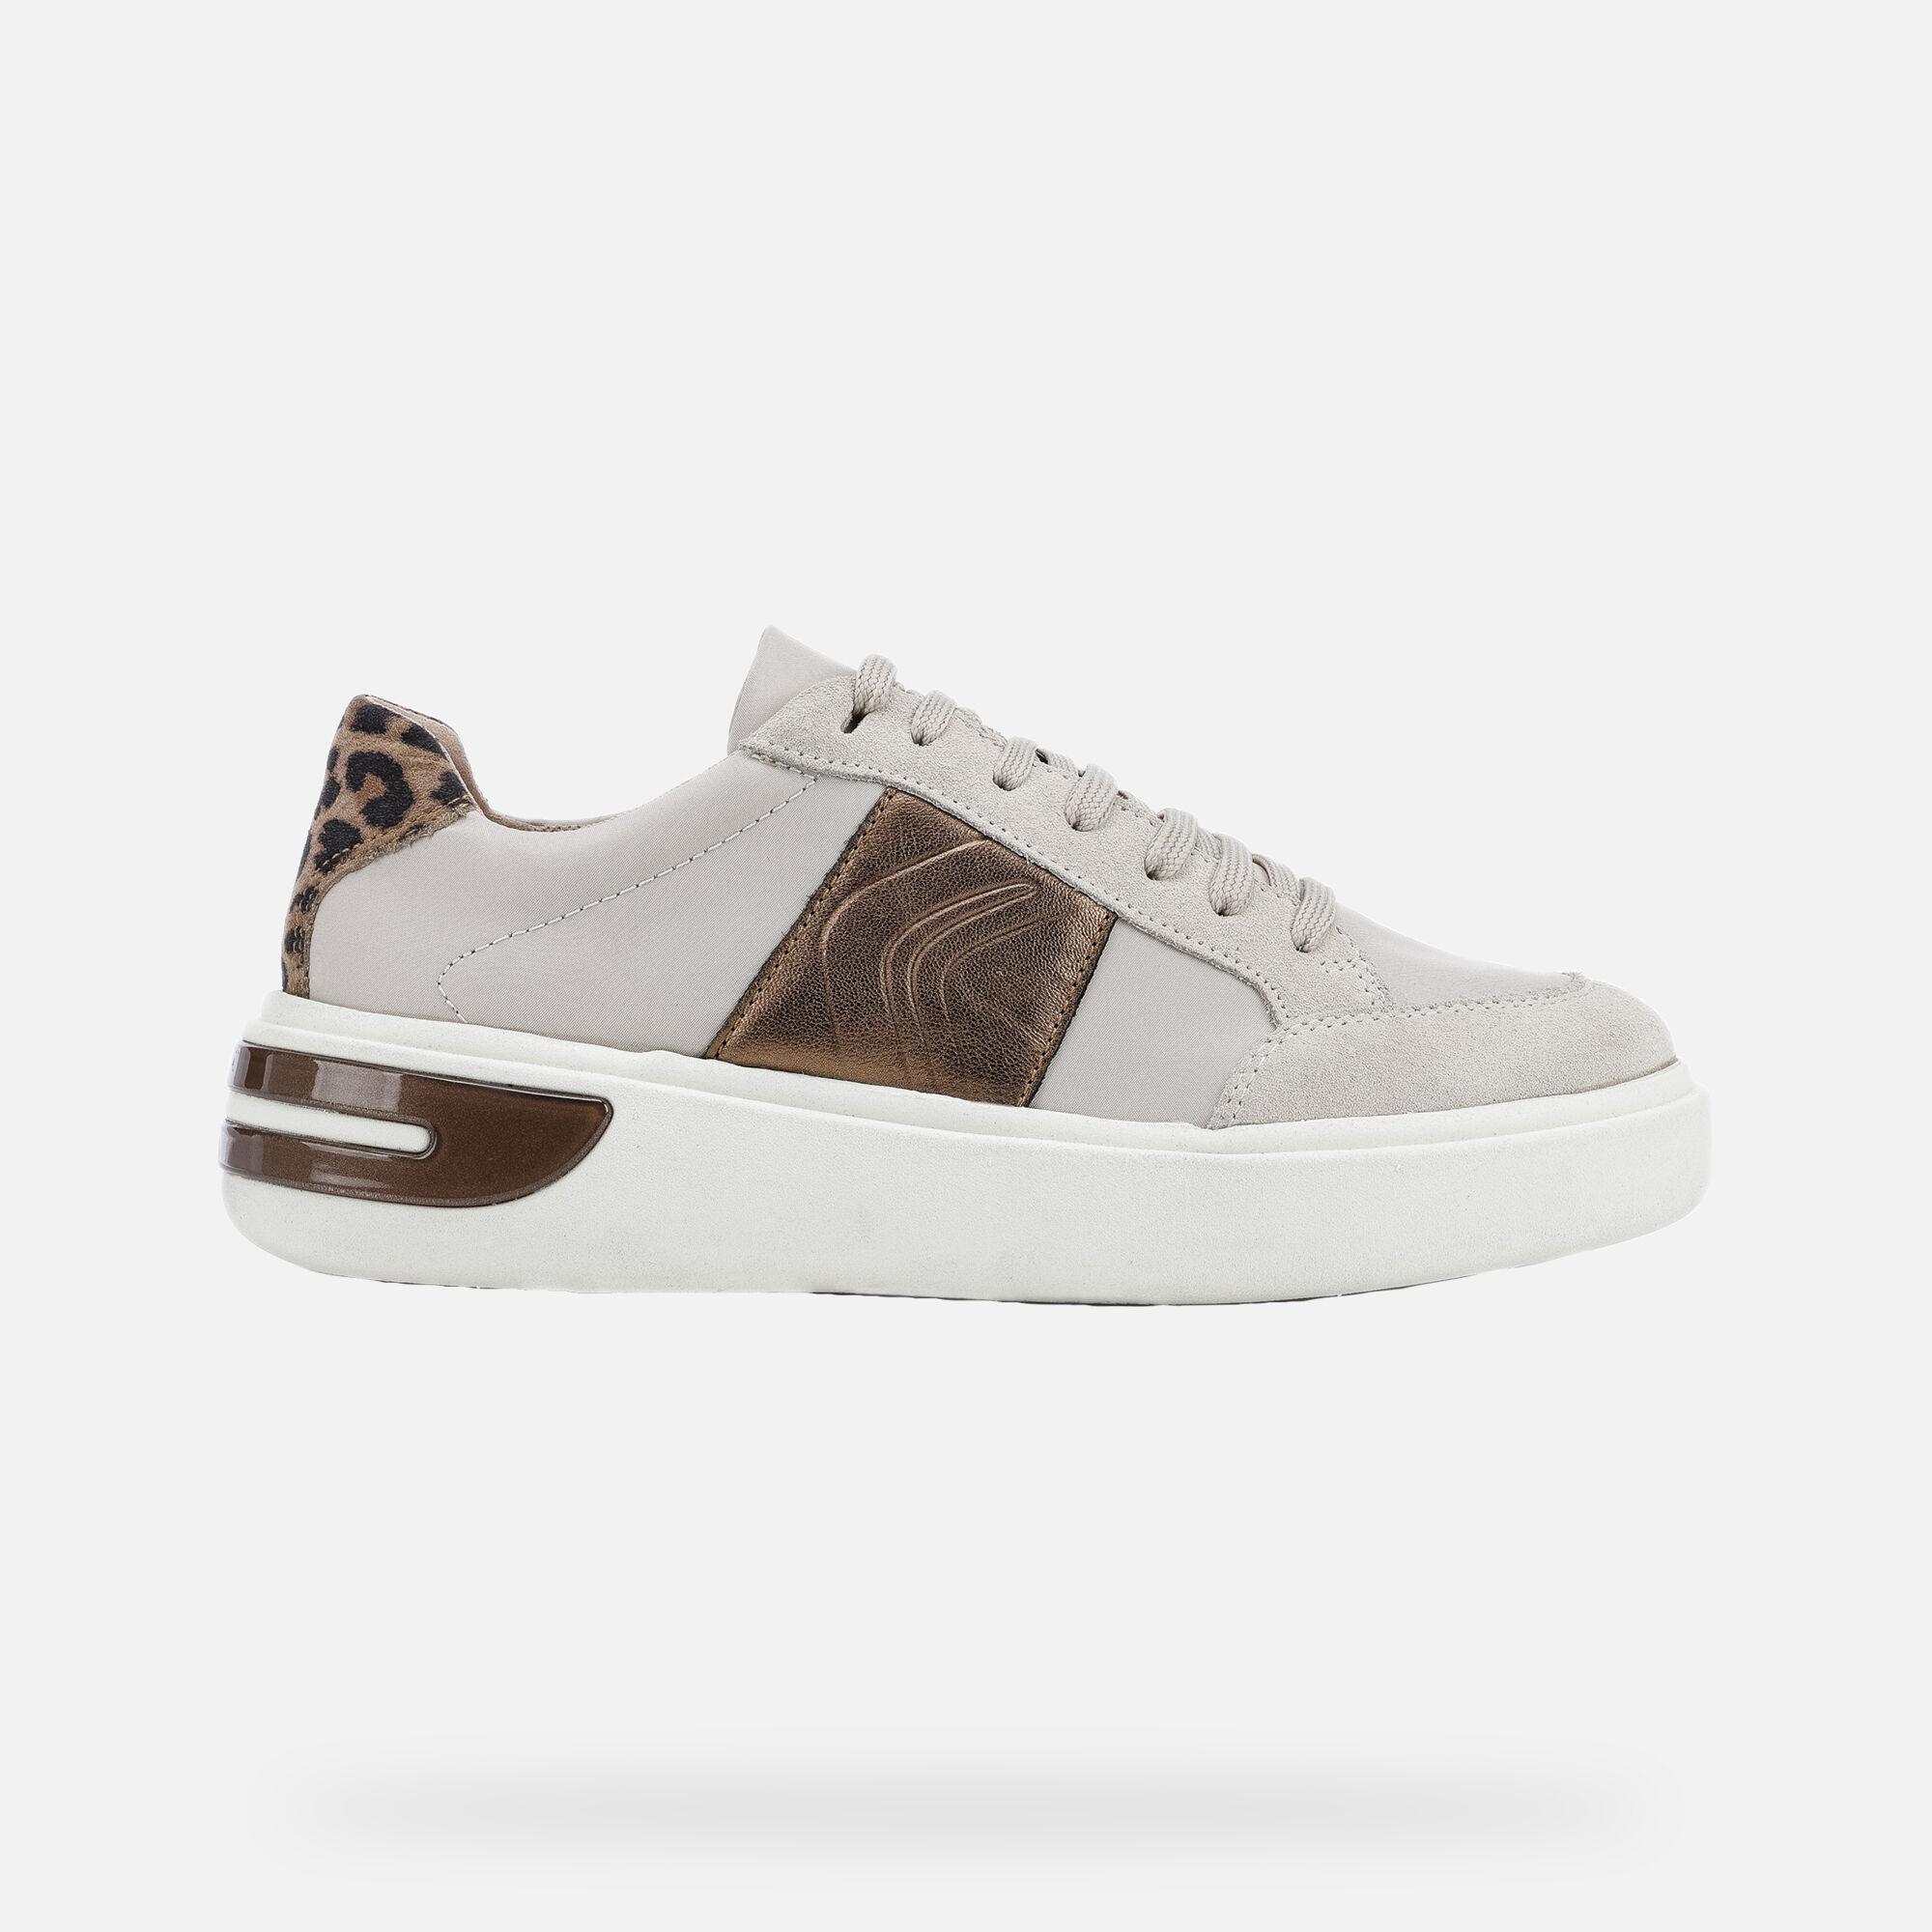 Geox OTTAYA Donna: Sneakers Basse Crema | Geox FW1920